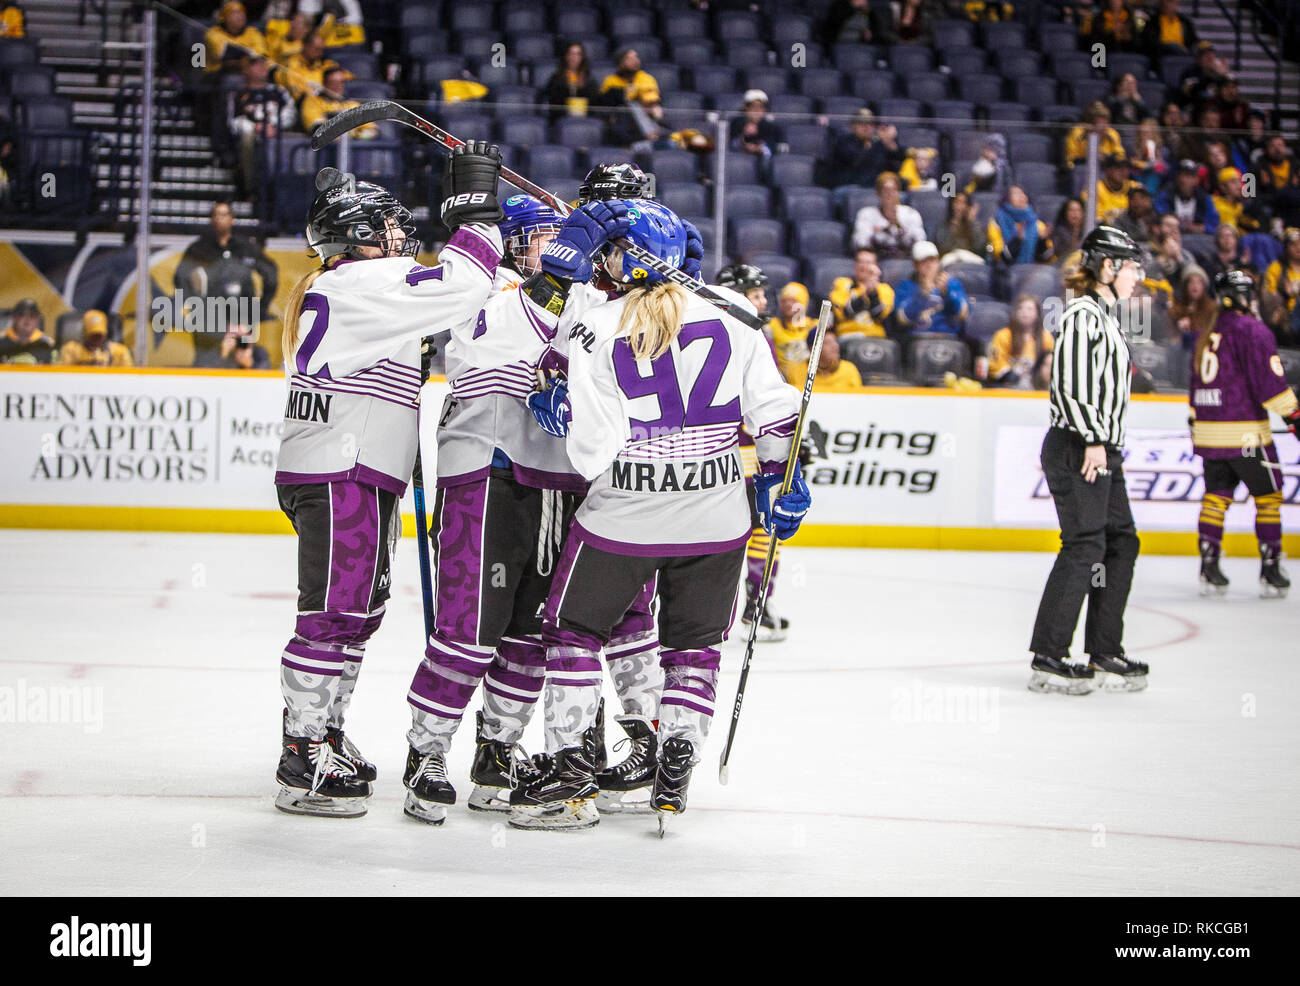 National Women S Hockey League Stock Photos National Women S